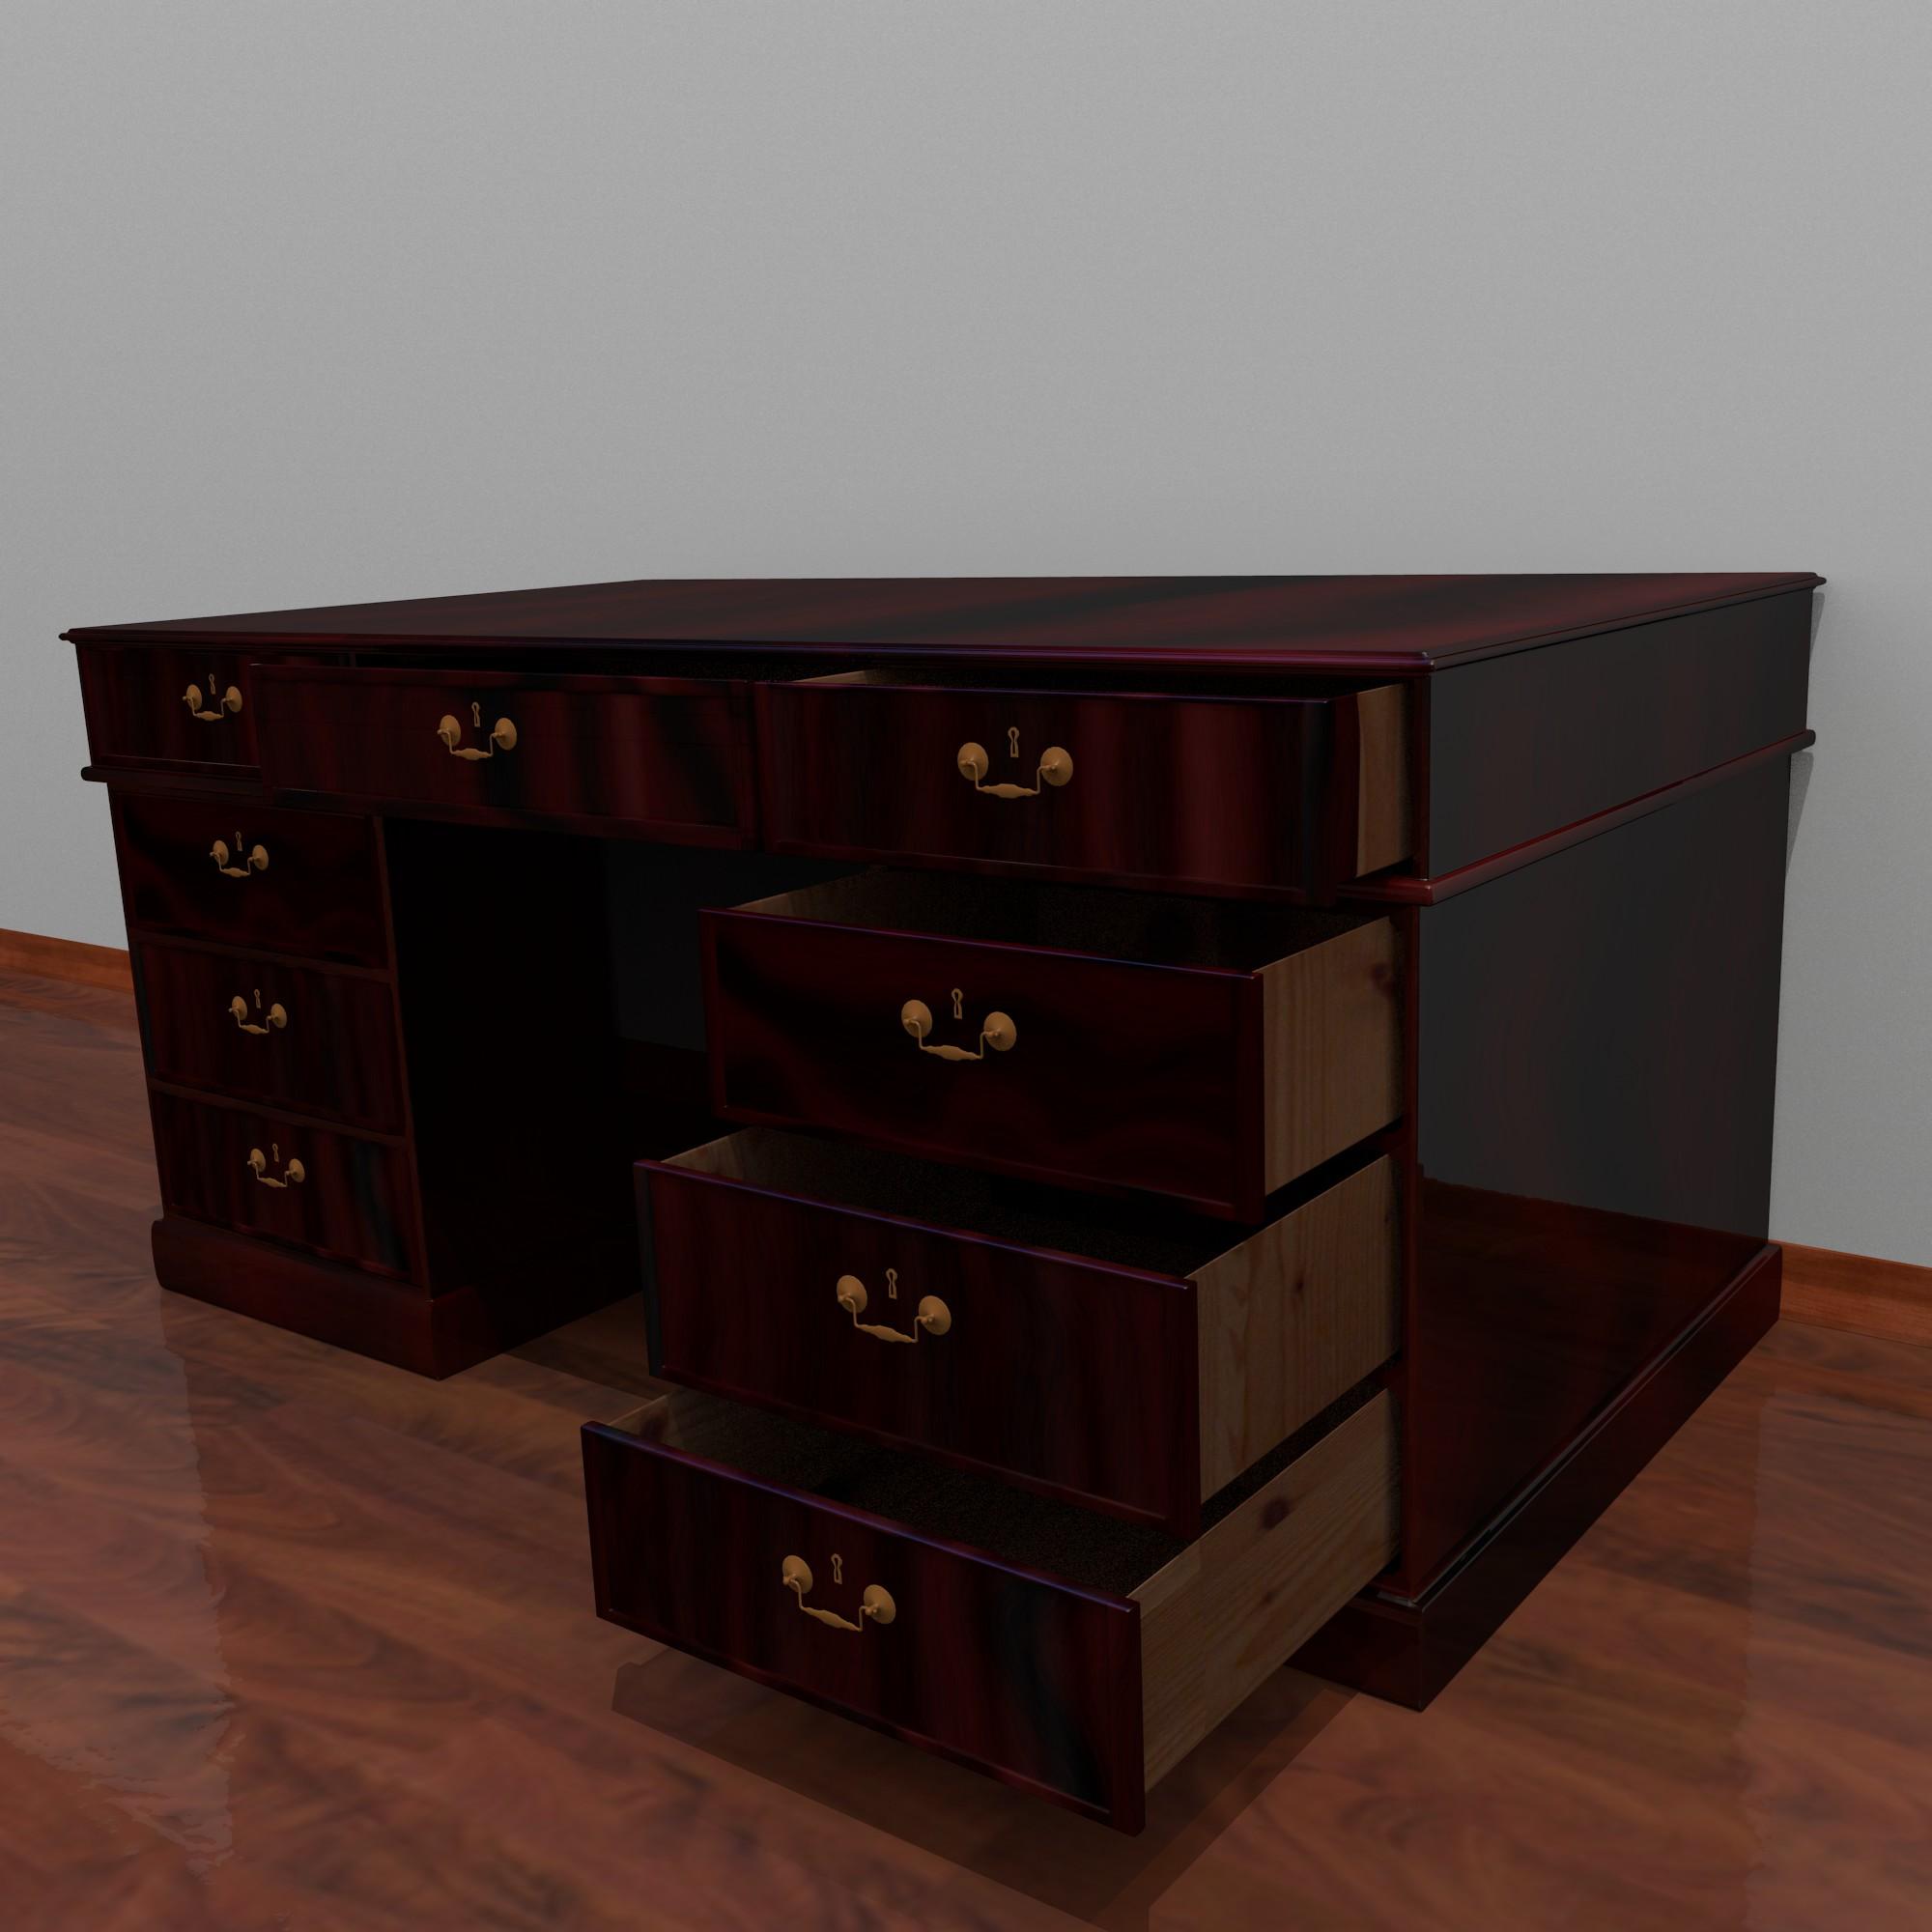 tumšs koka galds 3d modelis fbx maisījums dae obj 117671